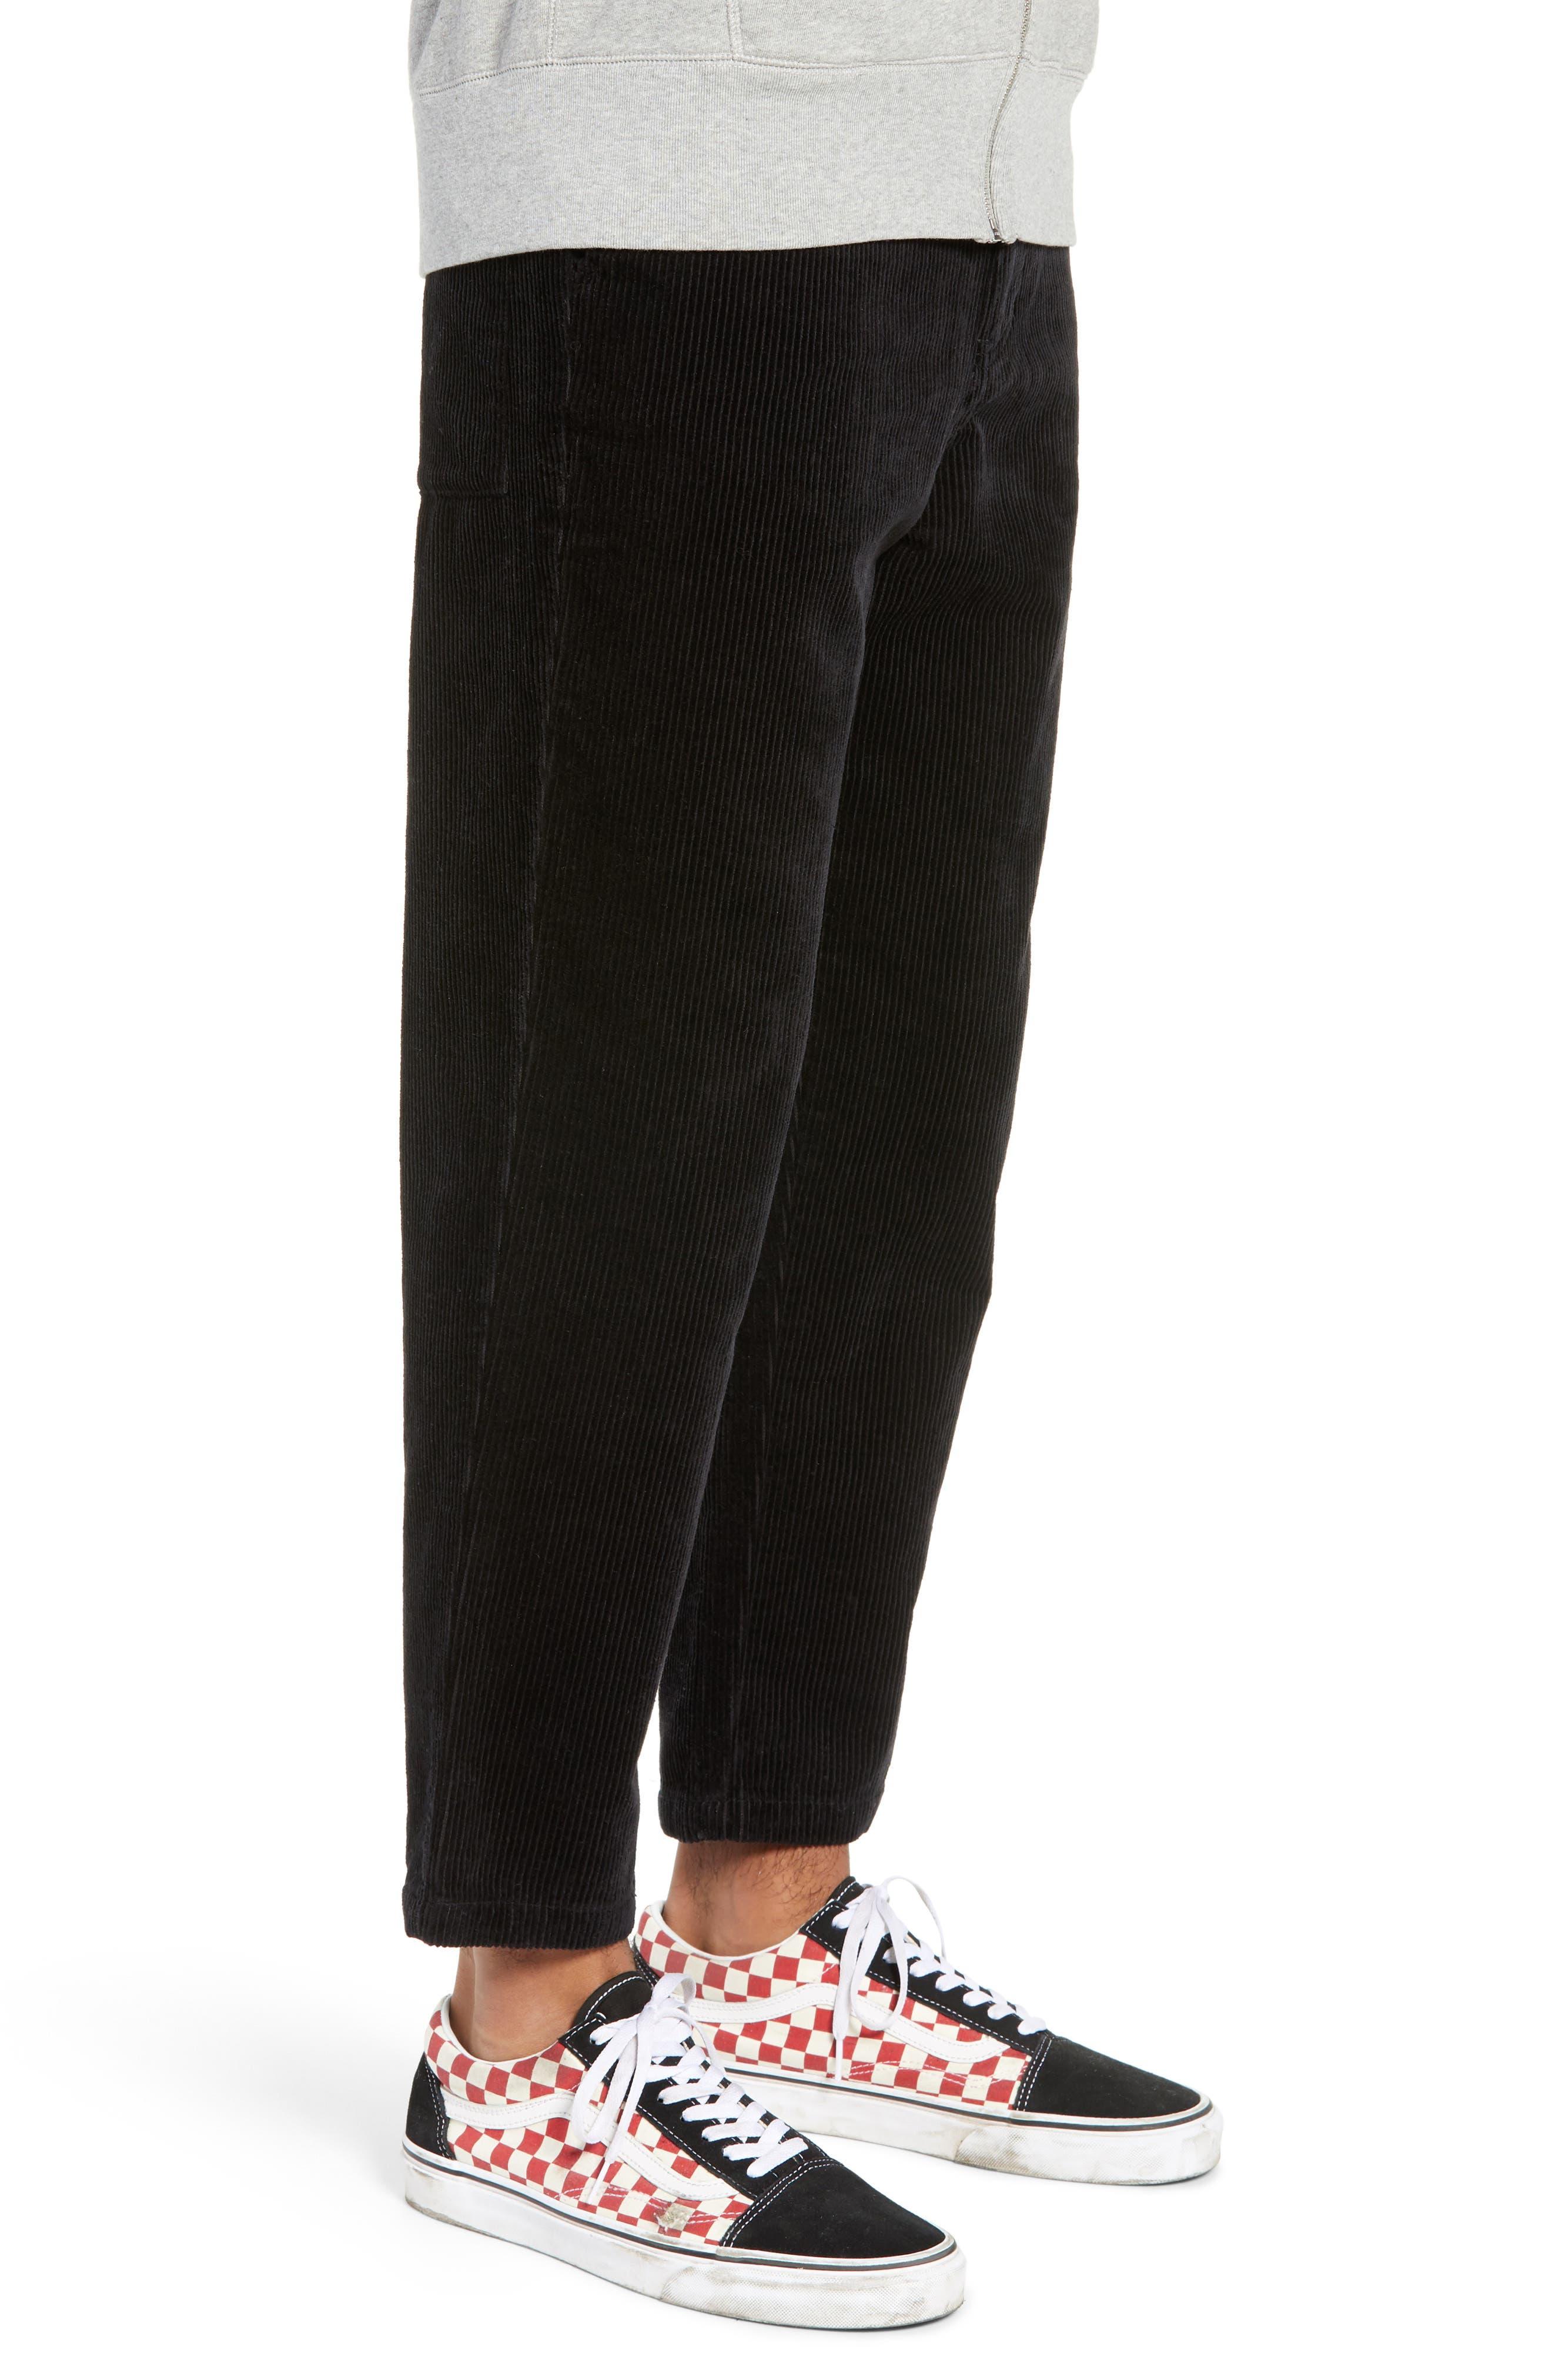 Iggy Wide Wale Cotton Corduroy Straight Leg Pants,                             Alternate thumbnail 3, color,                             BLACK